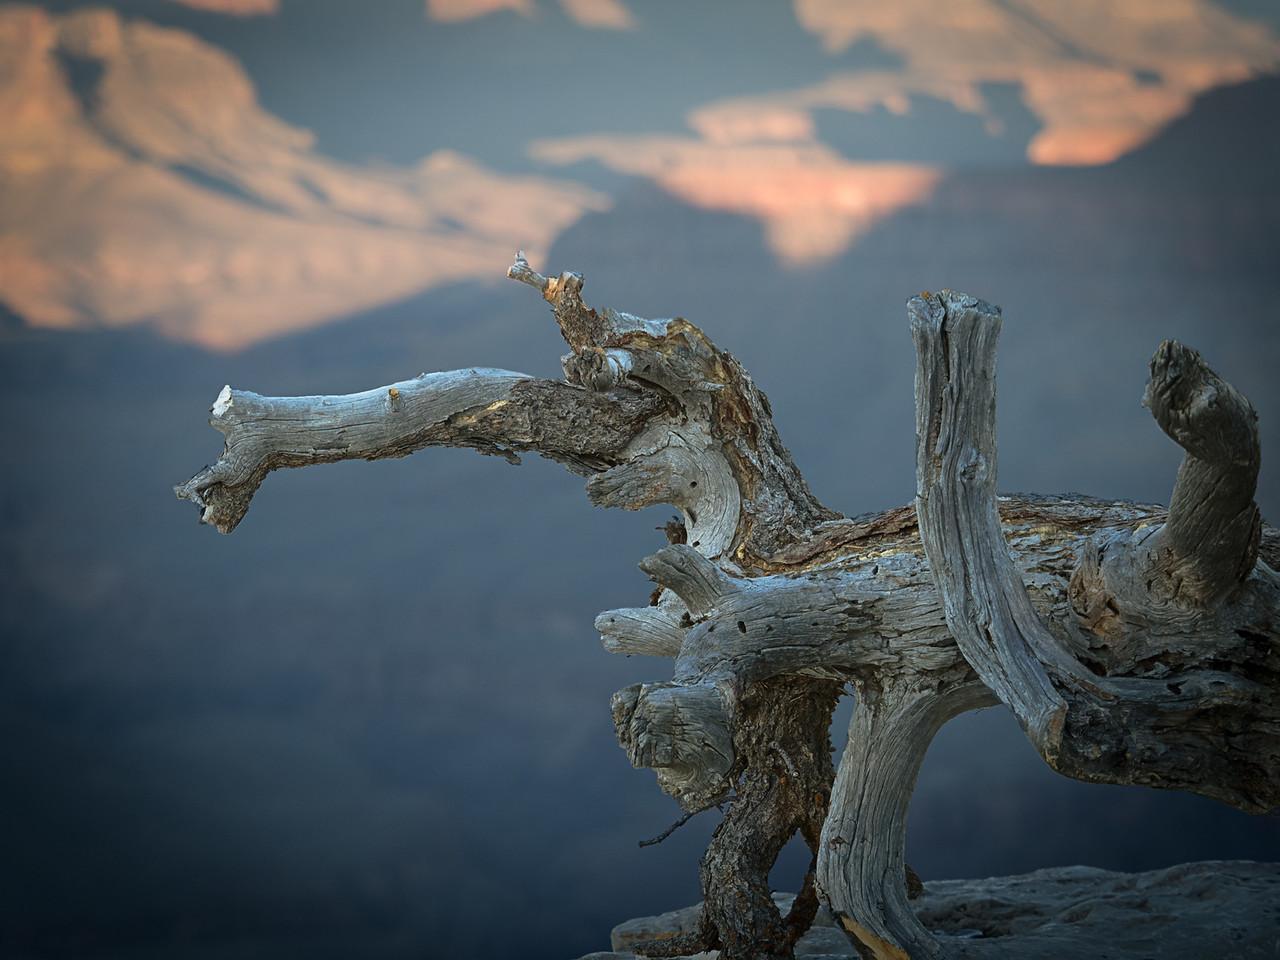 3-Intermediate-Open-DNP-Hiroshi_Kamaya-Dragon_in_Grand_Canyon